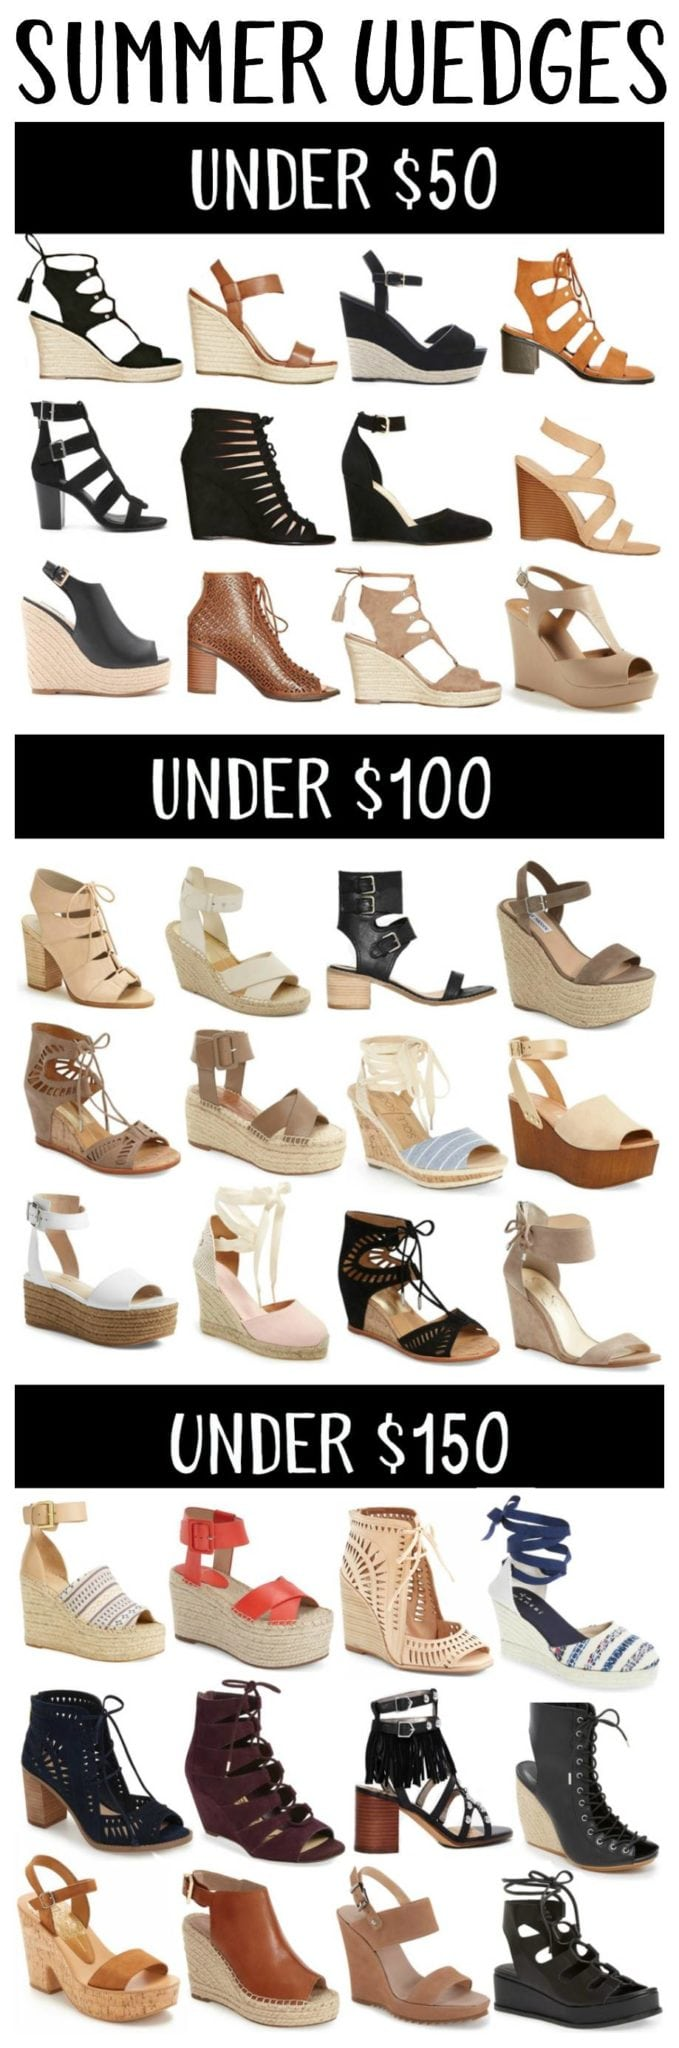 Mash Elle beauty blogger | wedge heels | summer wedges | trendy wedges for summer | summer fashion | wedges under $50